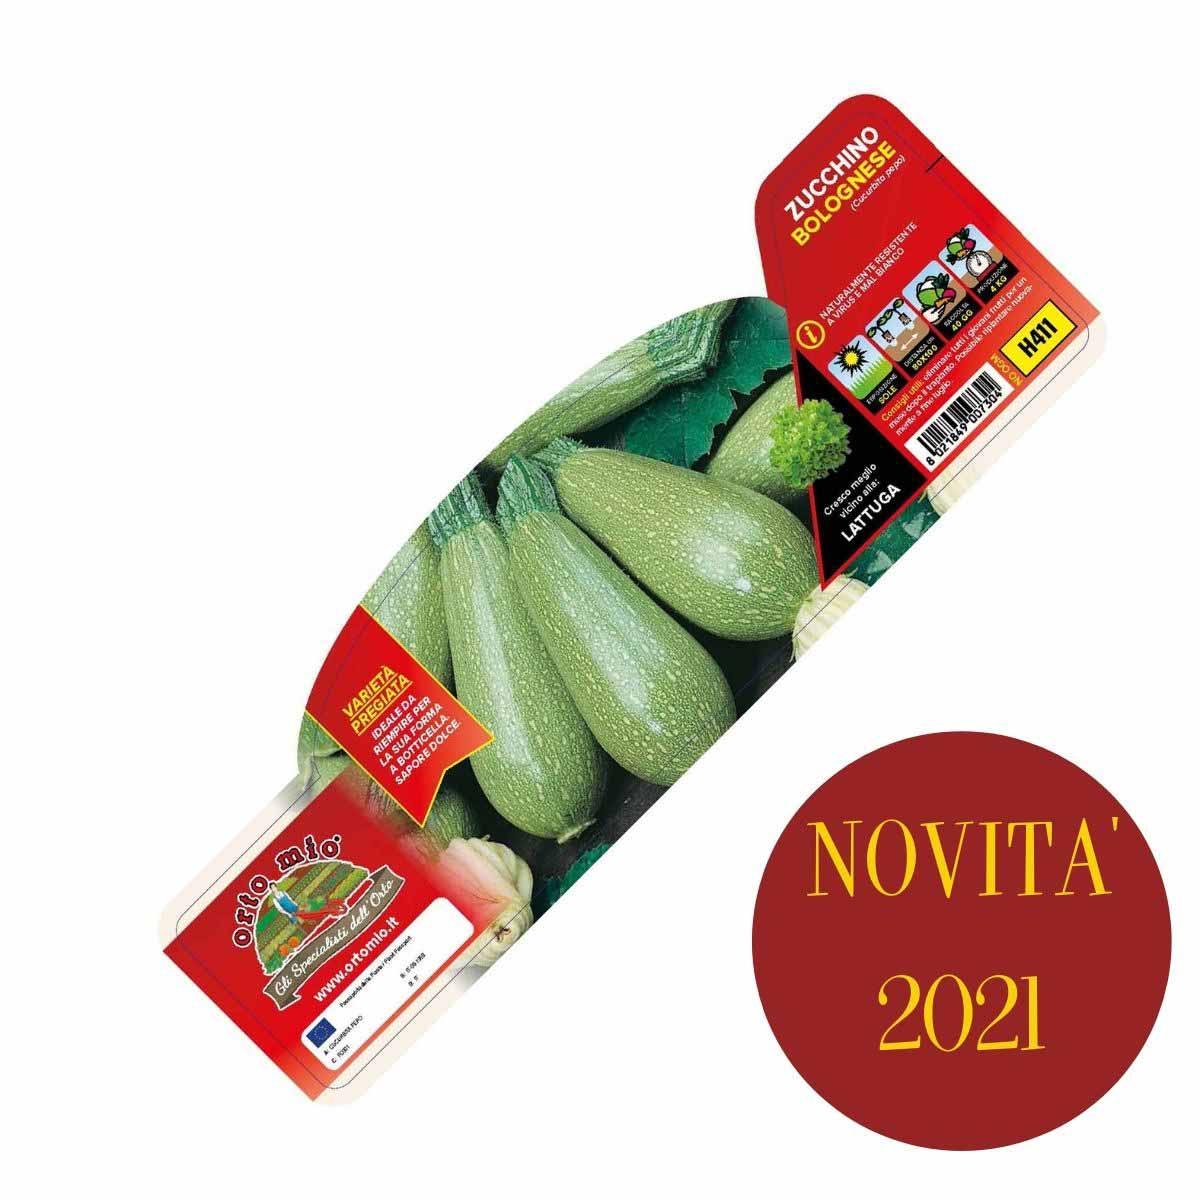 Zucchino Bolognese var. Mexicana F1